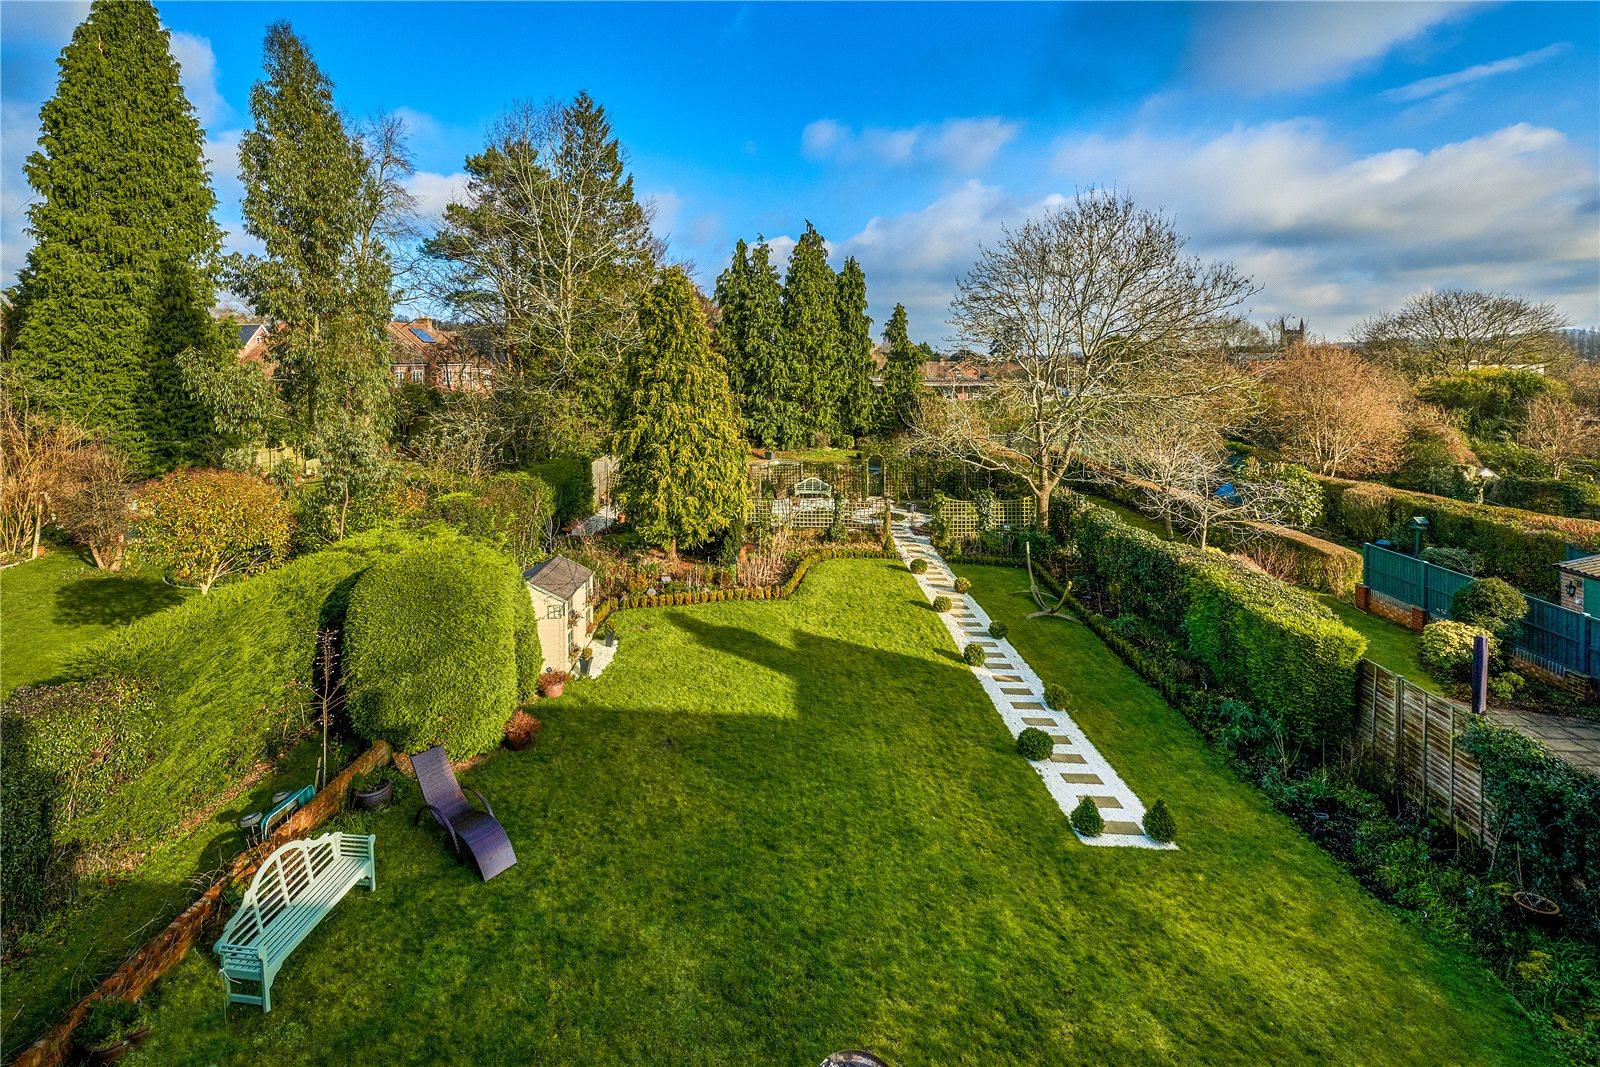 独户住宅 为 销售 在 Crondall Lane, Farnham, Surrey, GU9 Farnham, 英格兰